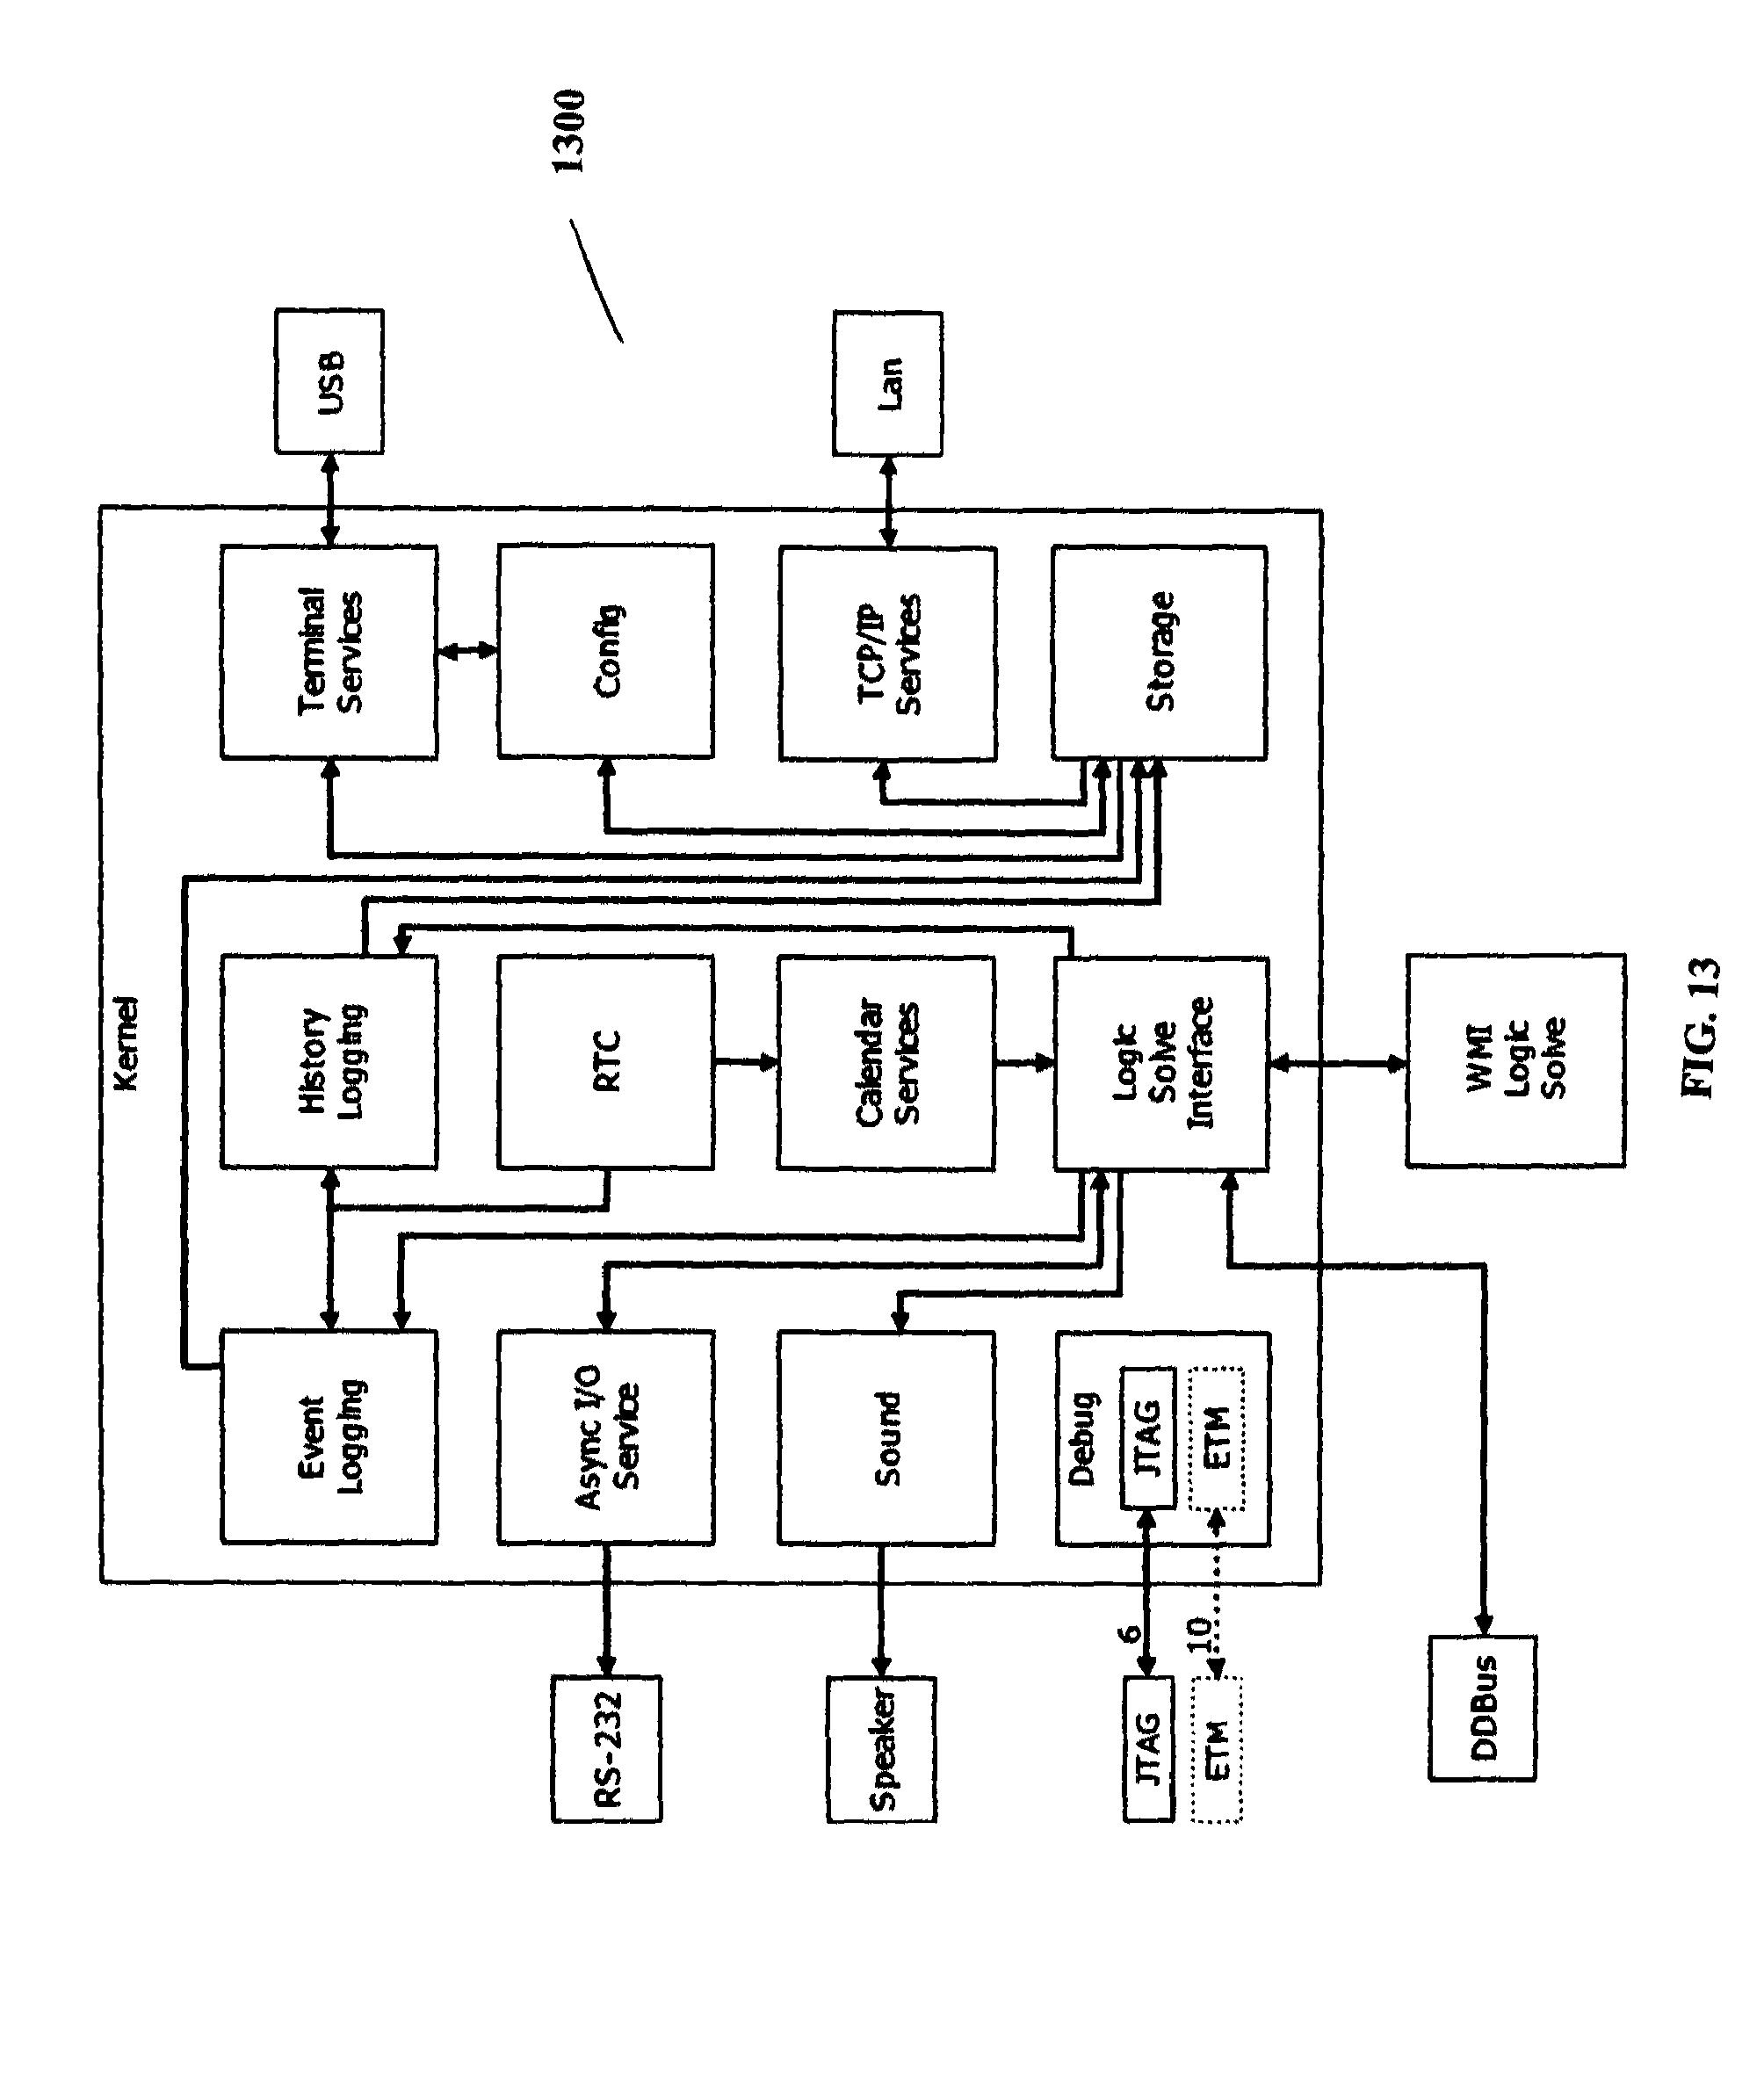 Fire Alarm Elevator Recall Wiring Diagram : 41 Wiring